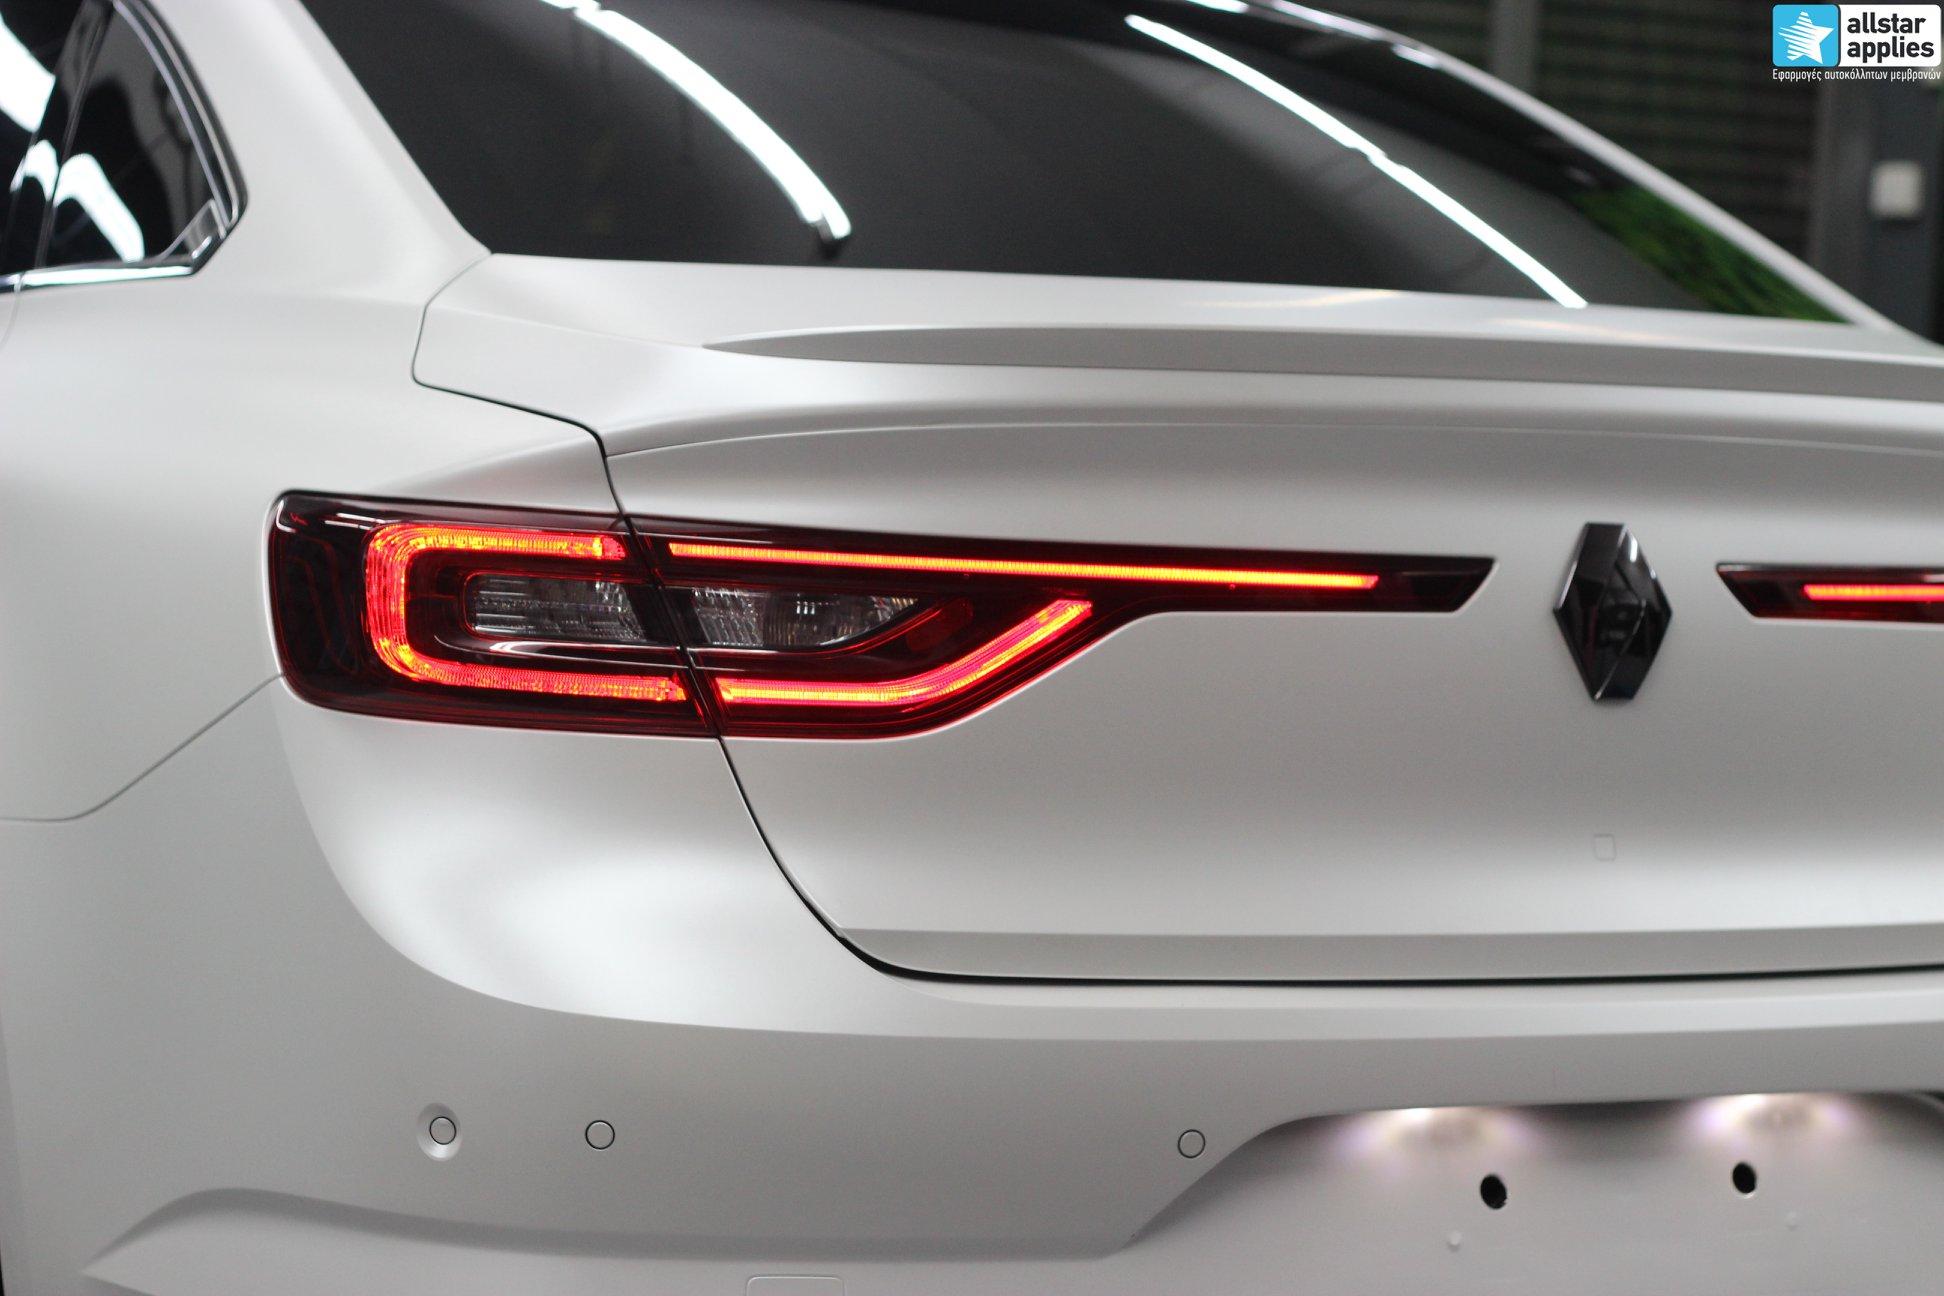 Renault Talisman - Satin Pearl White (3)